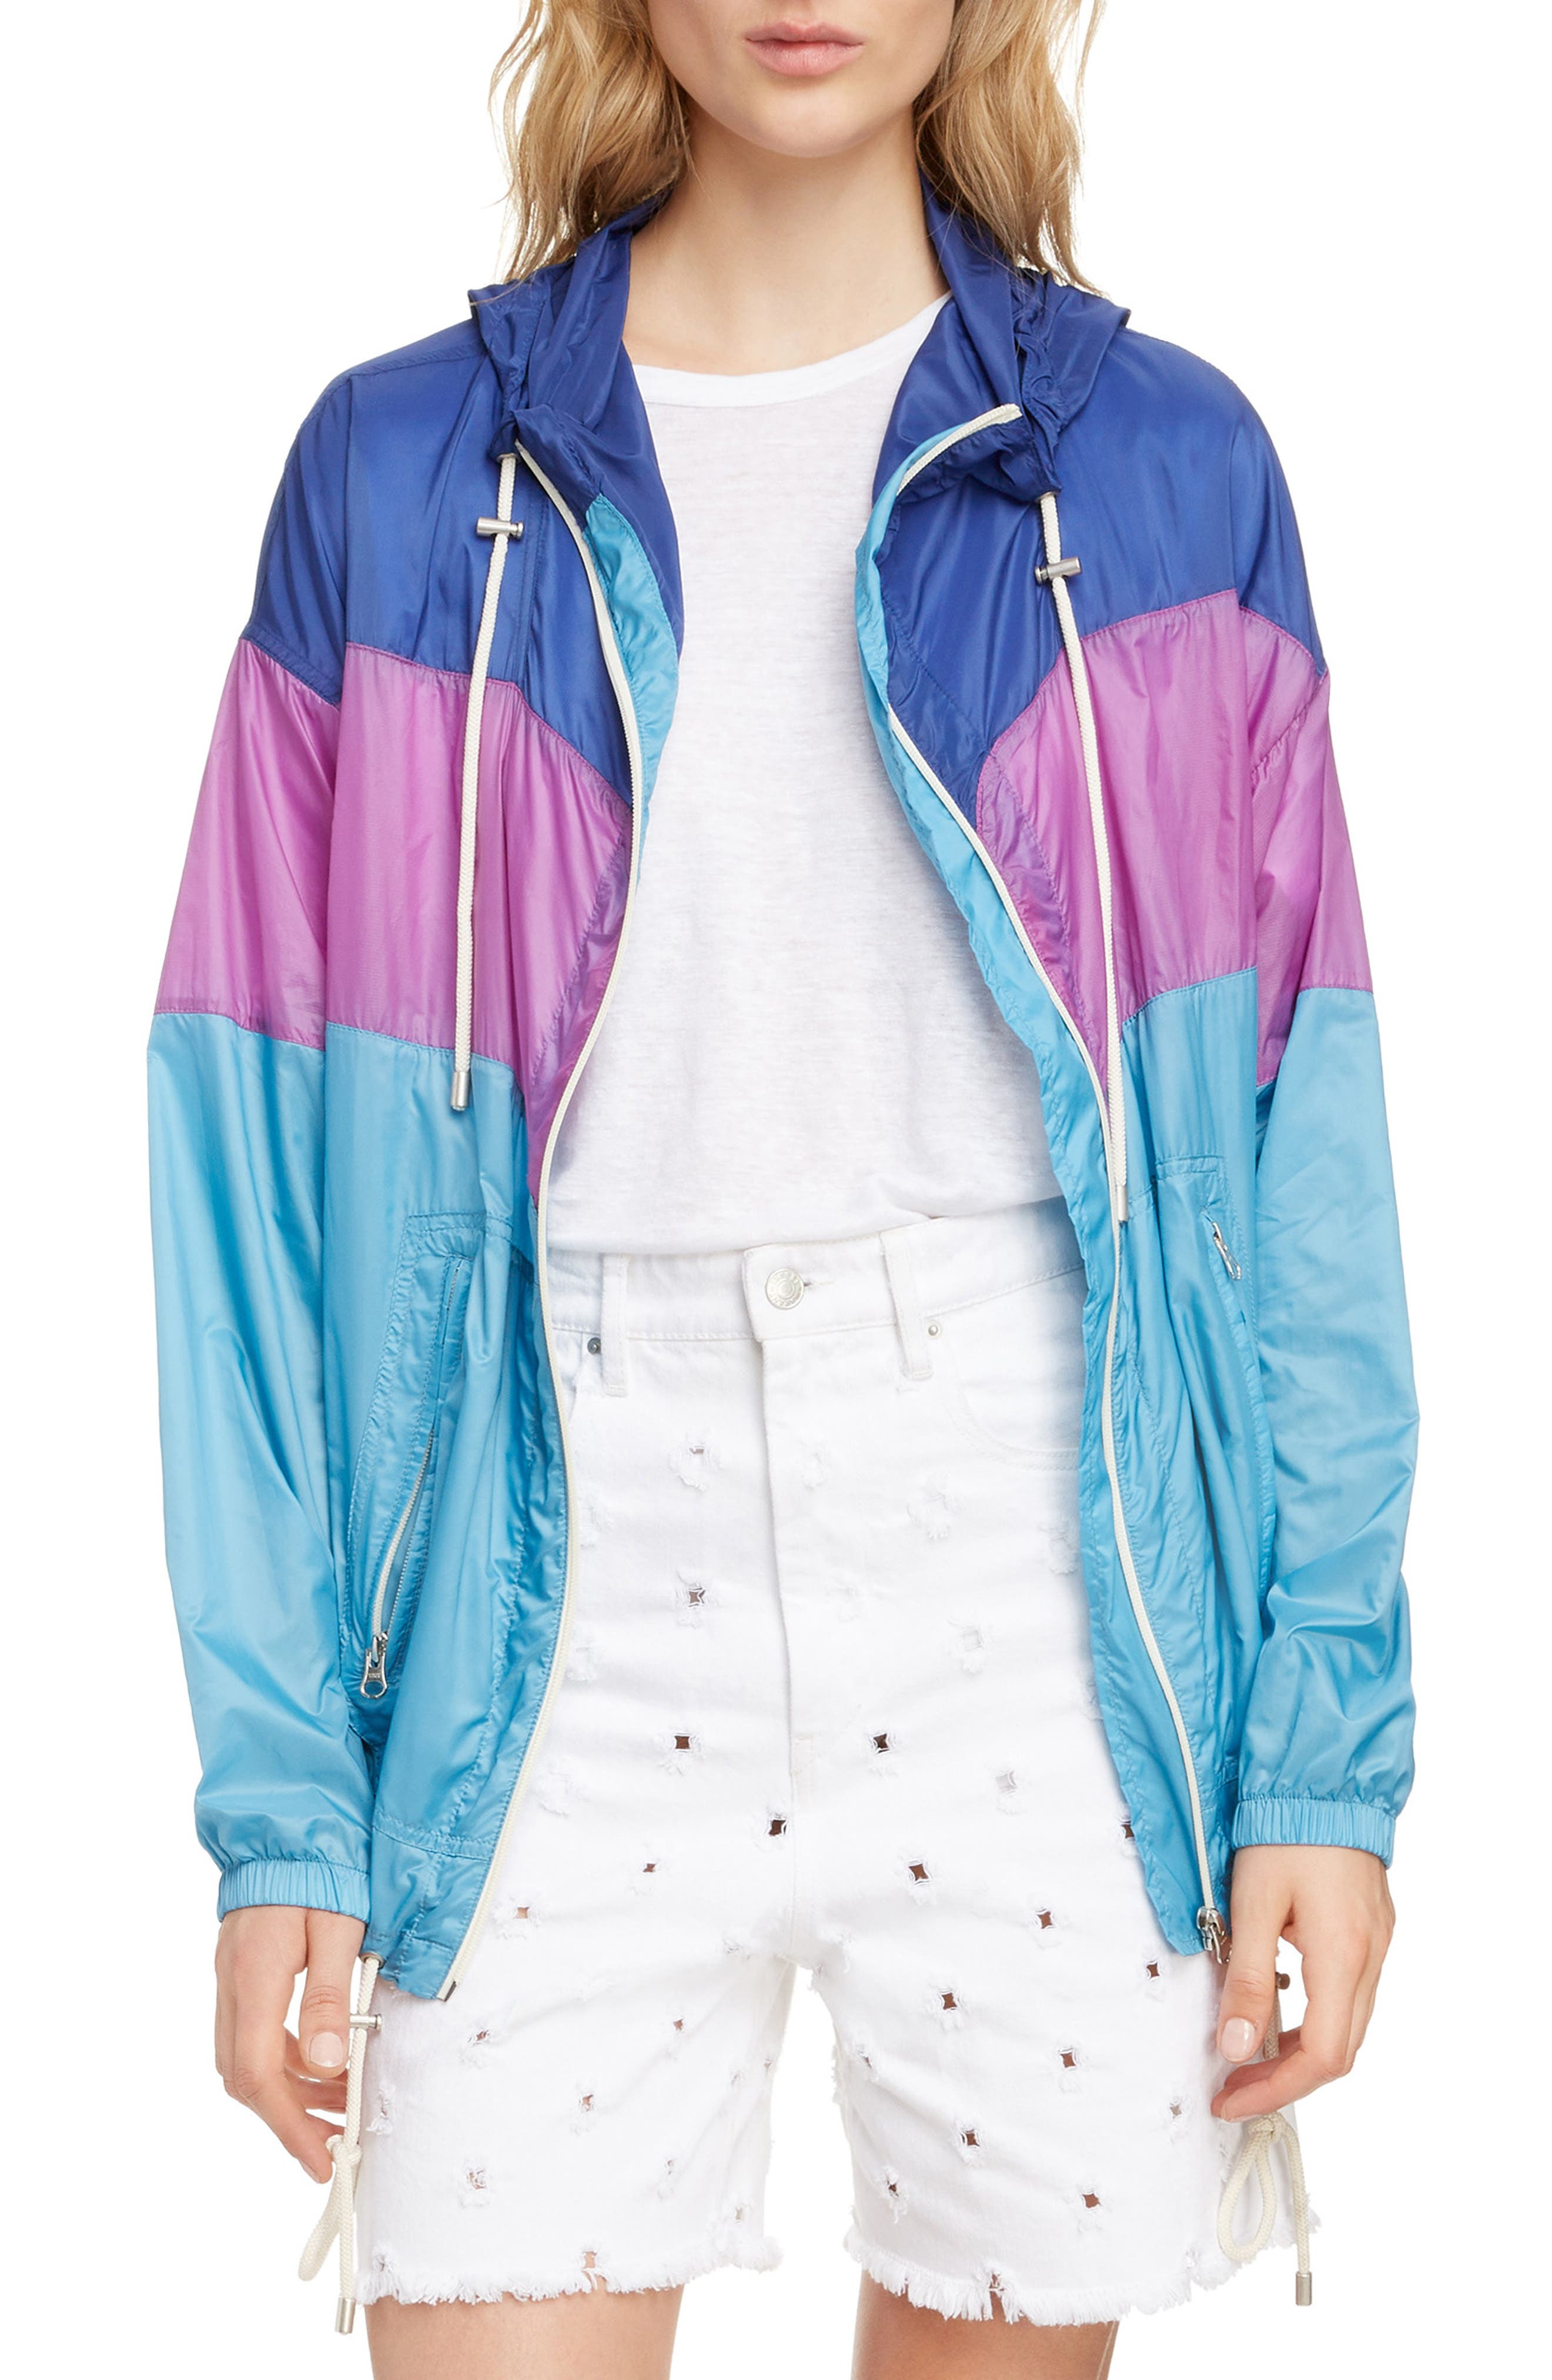 ISABEL MARANT ÉTOILE Kyriel Colorblock Hooded Jacket, Main, color, ELECTRIC BLUE/ VIOLET